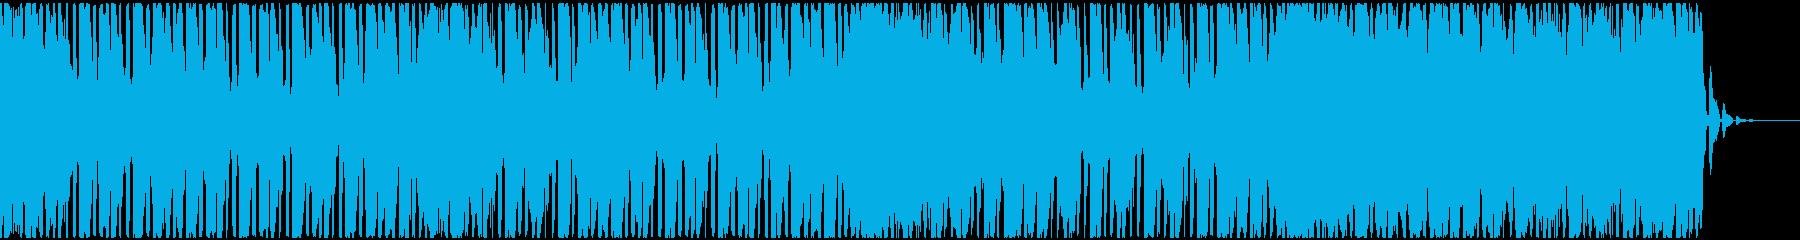 【EDM】トランス、ミディアム2の再生済みの波形